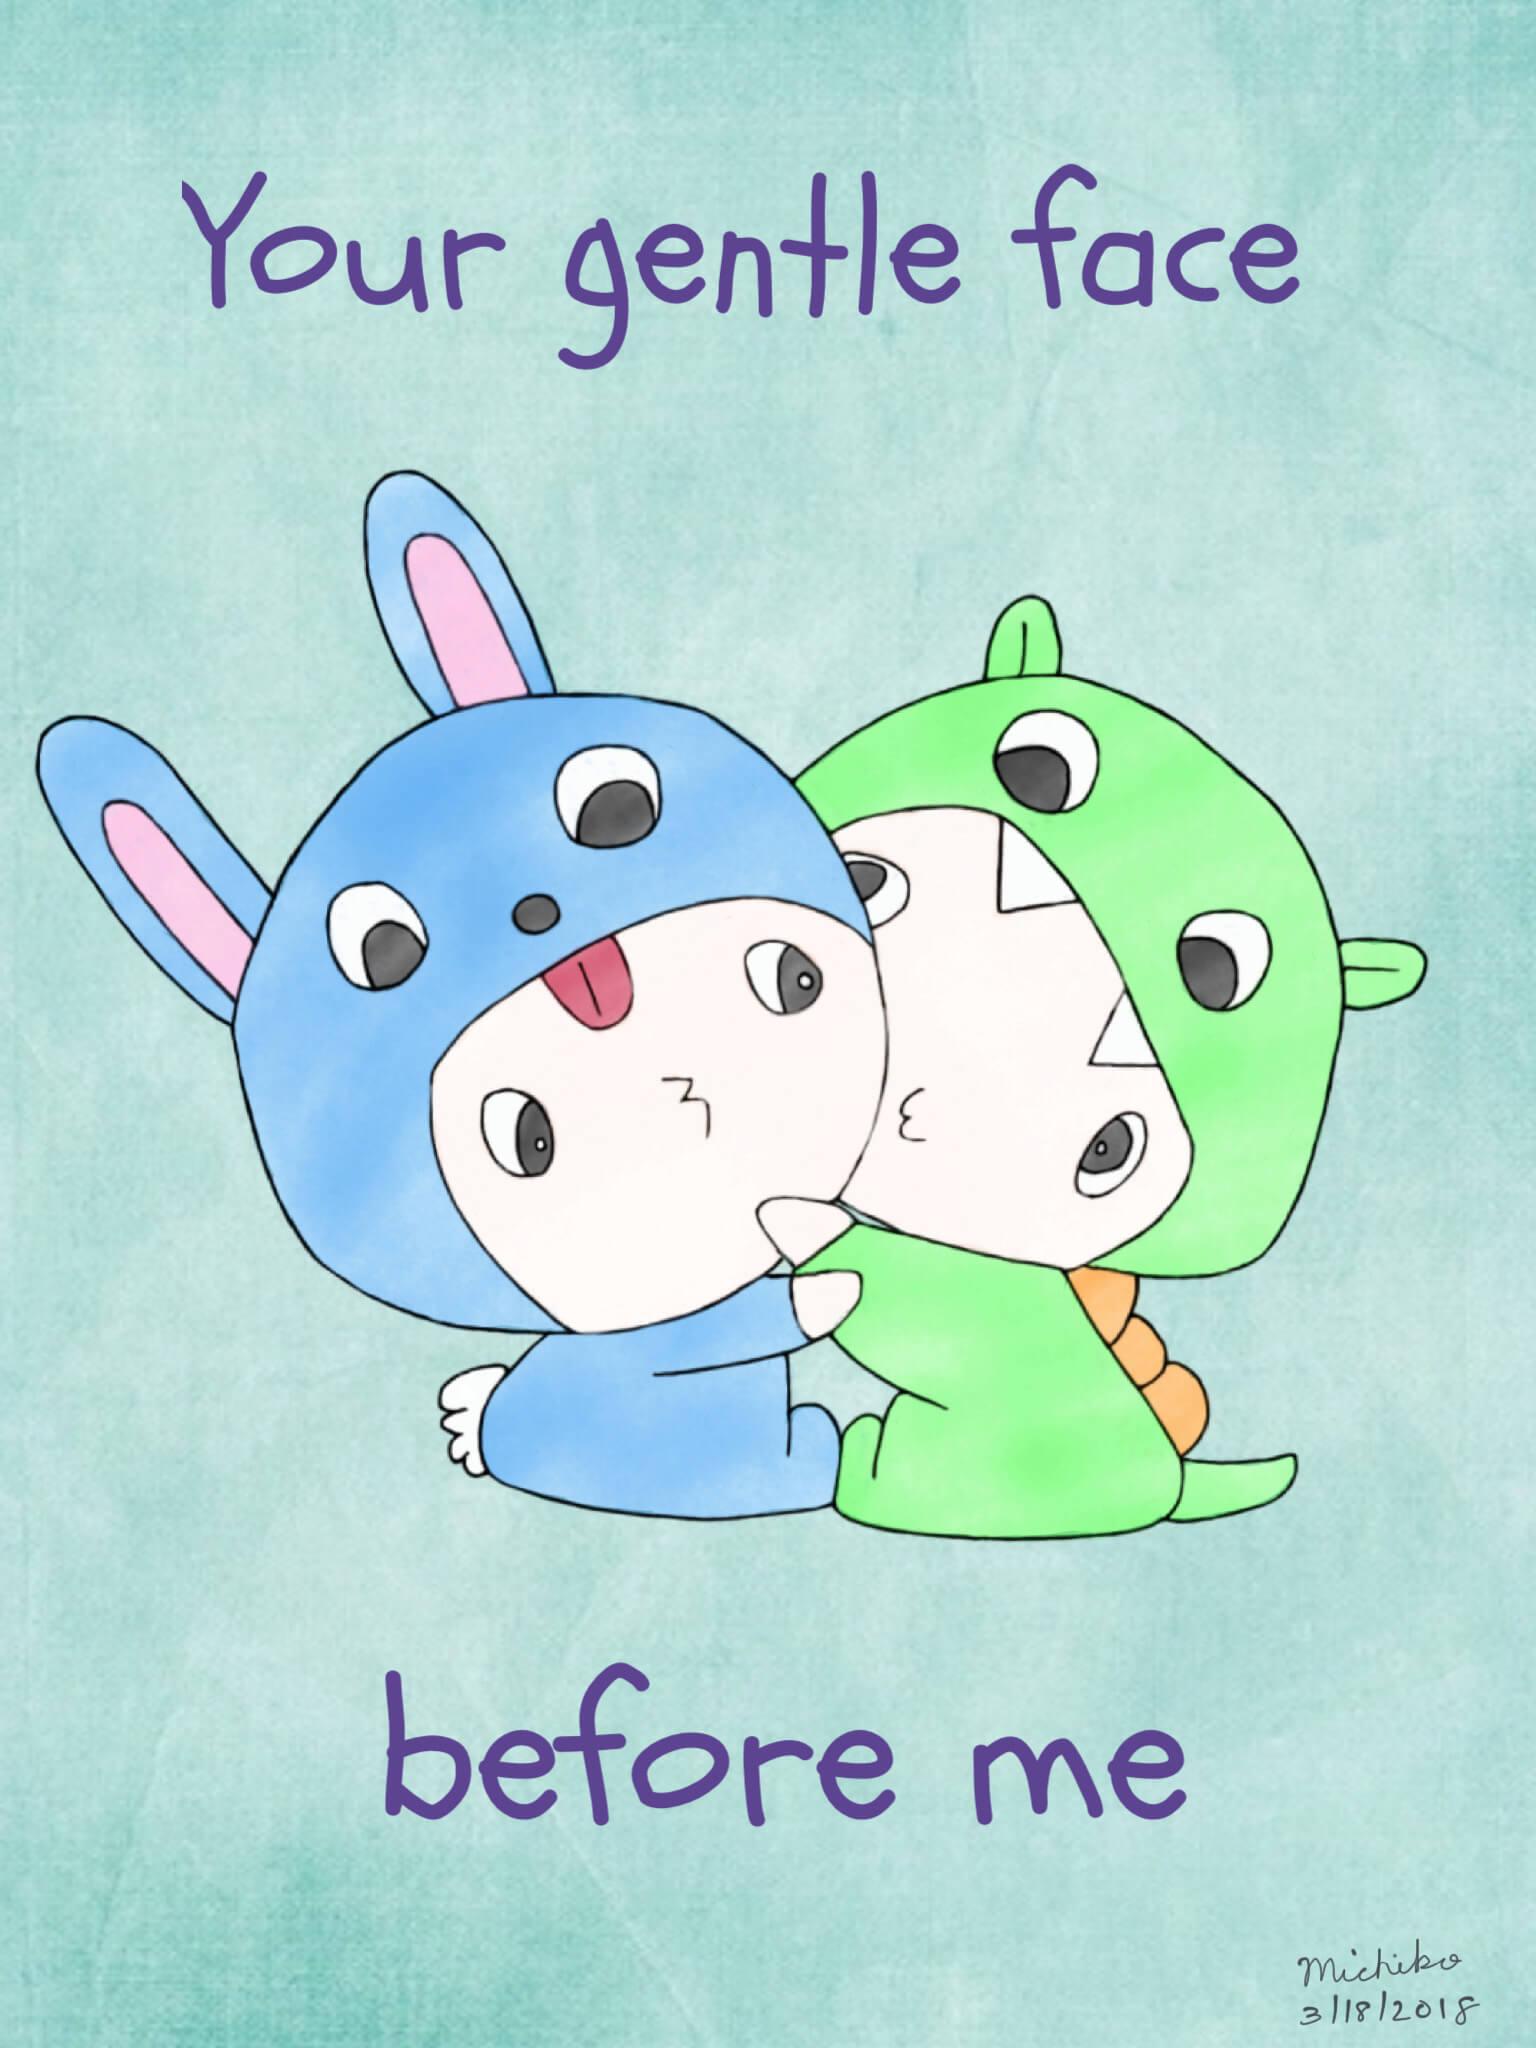 Gentle face